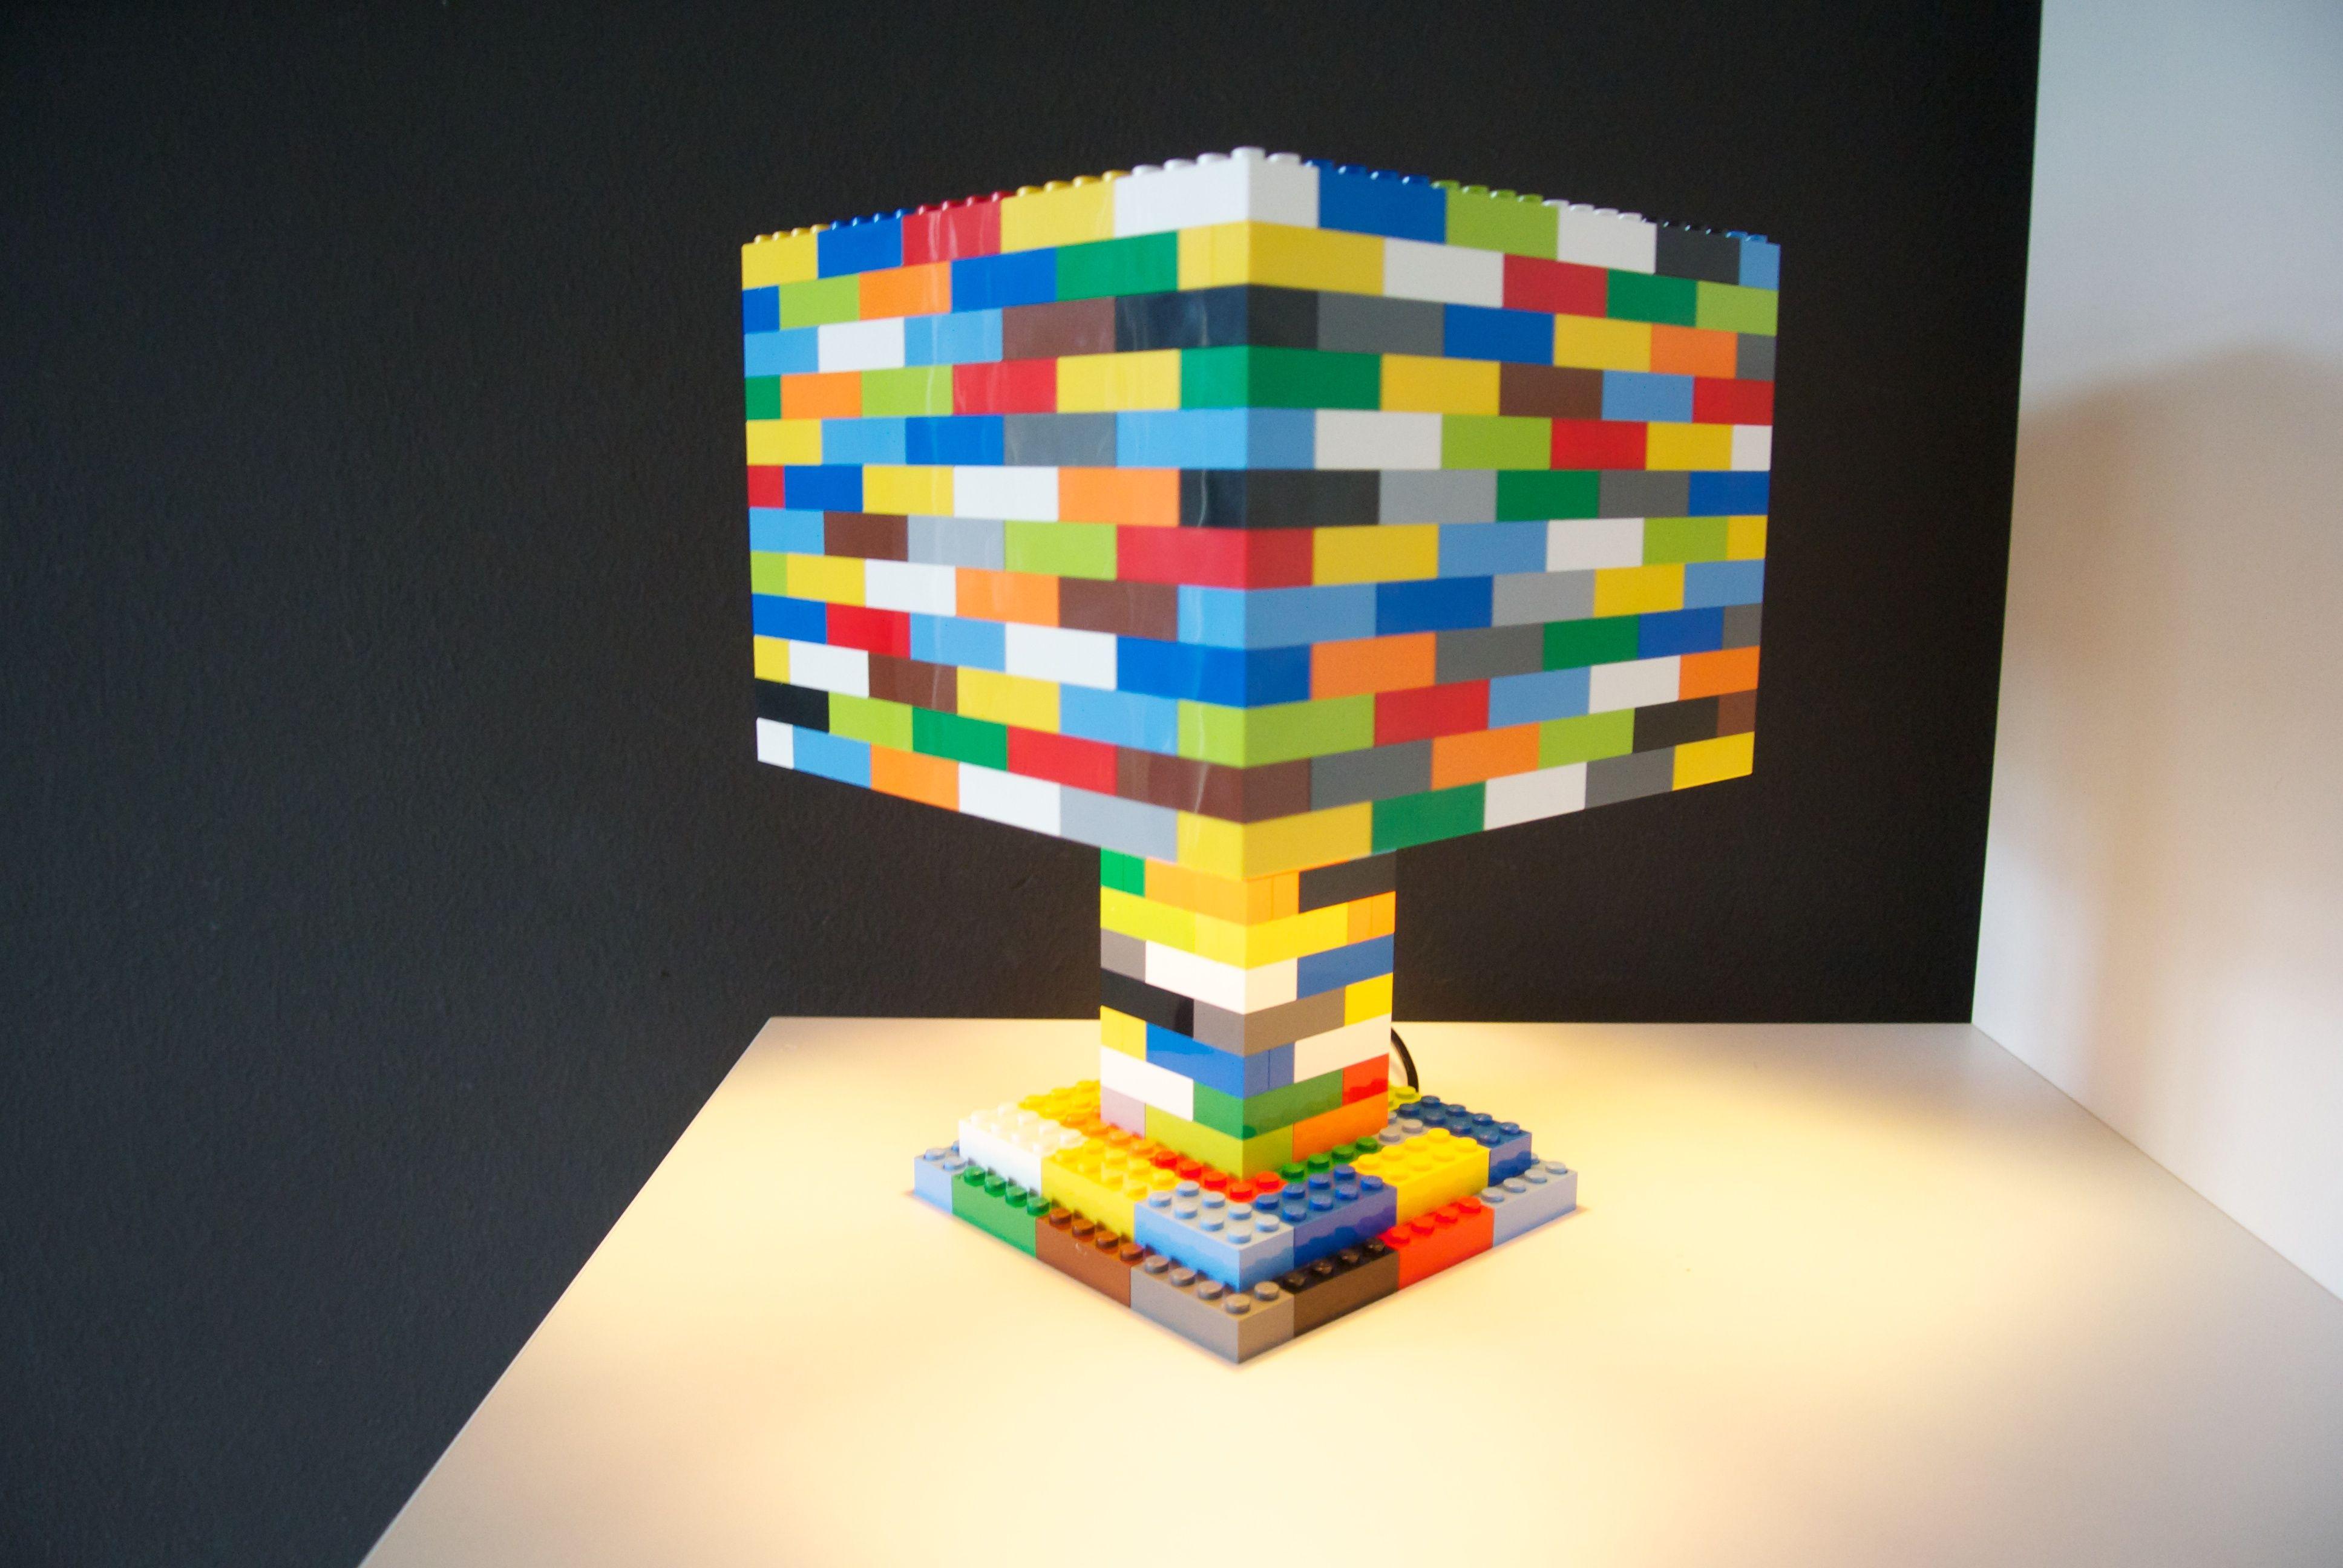 farbenfröhliche lego-lampe von lesign // colorful handmade lego